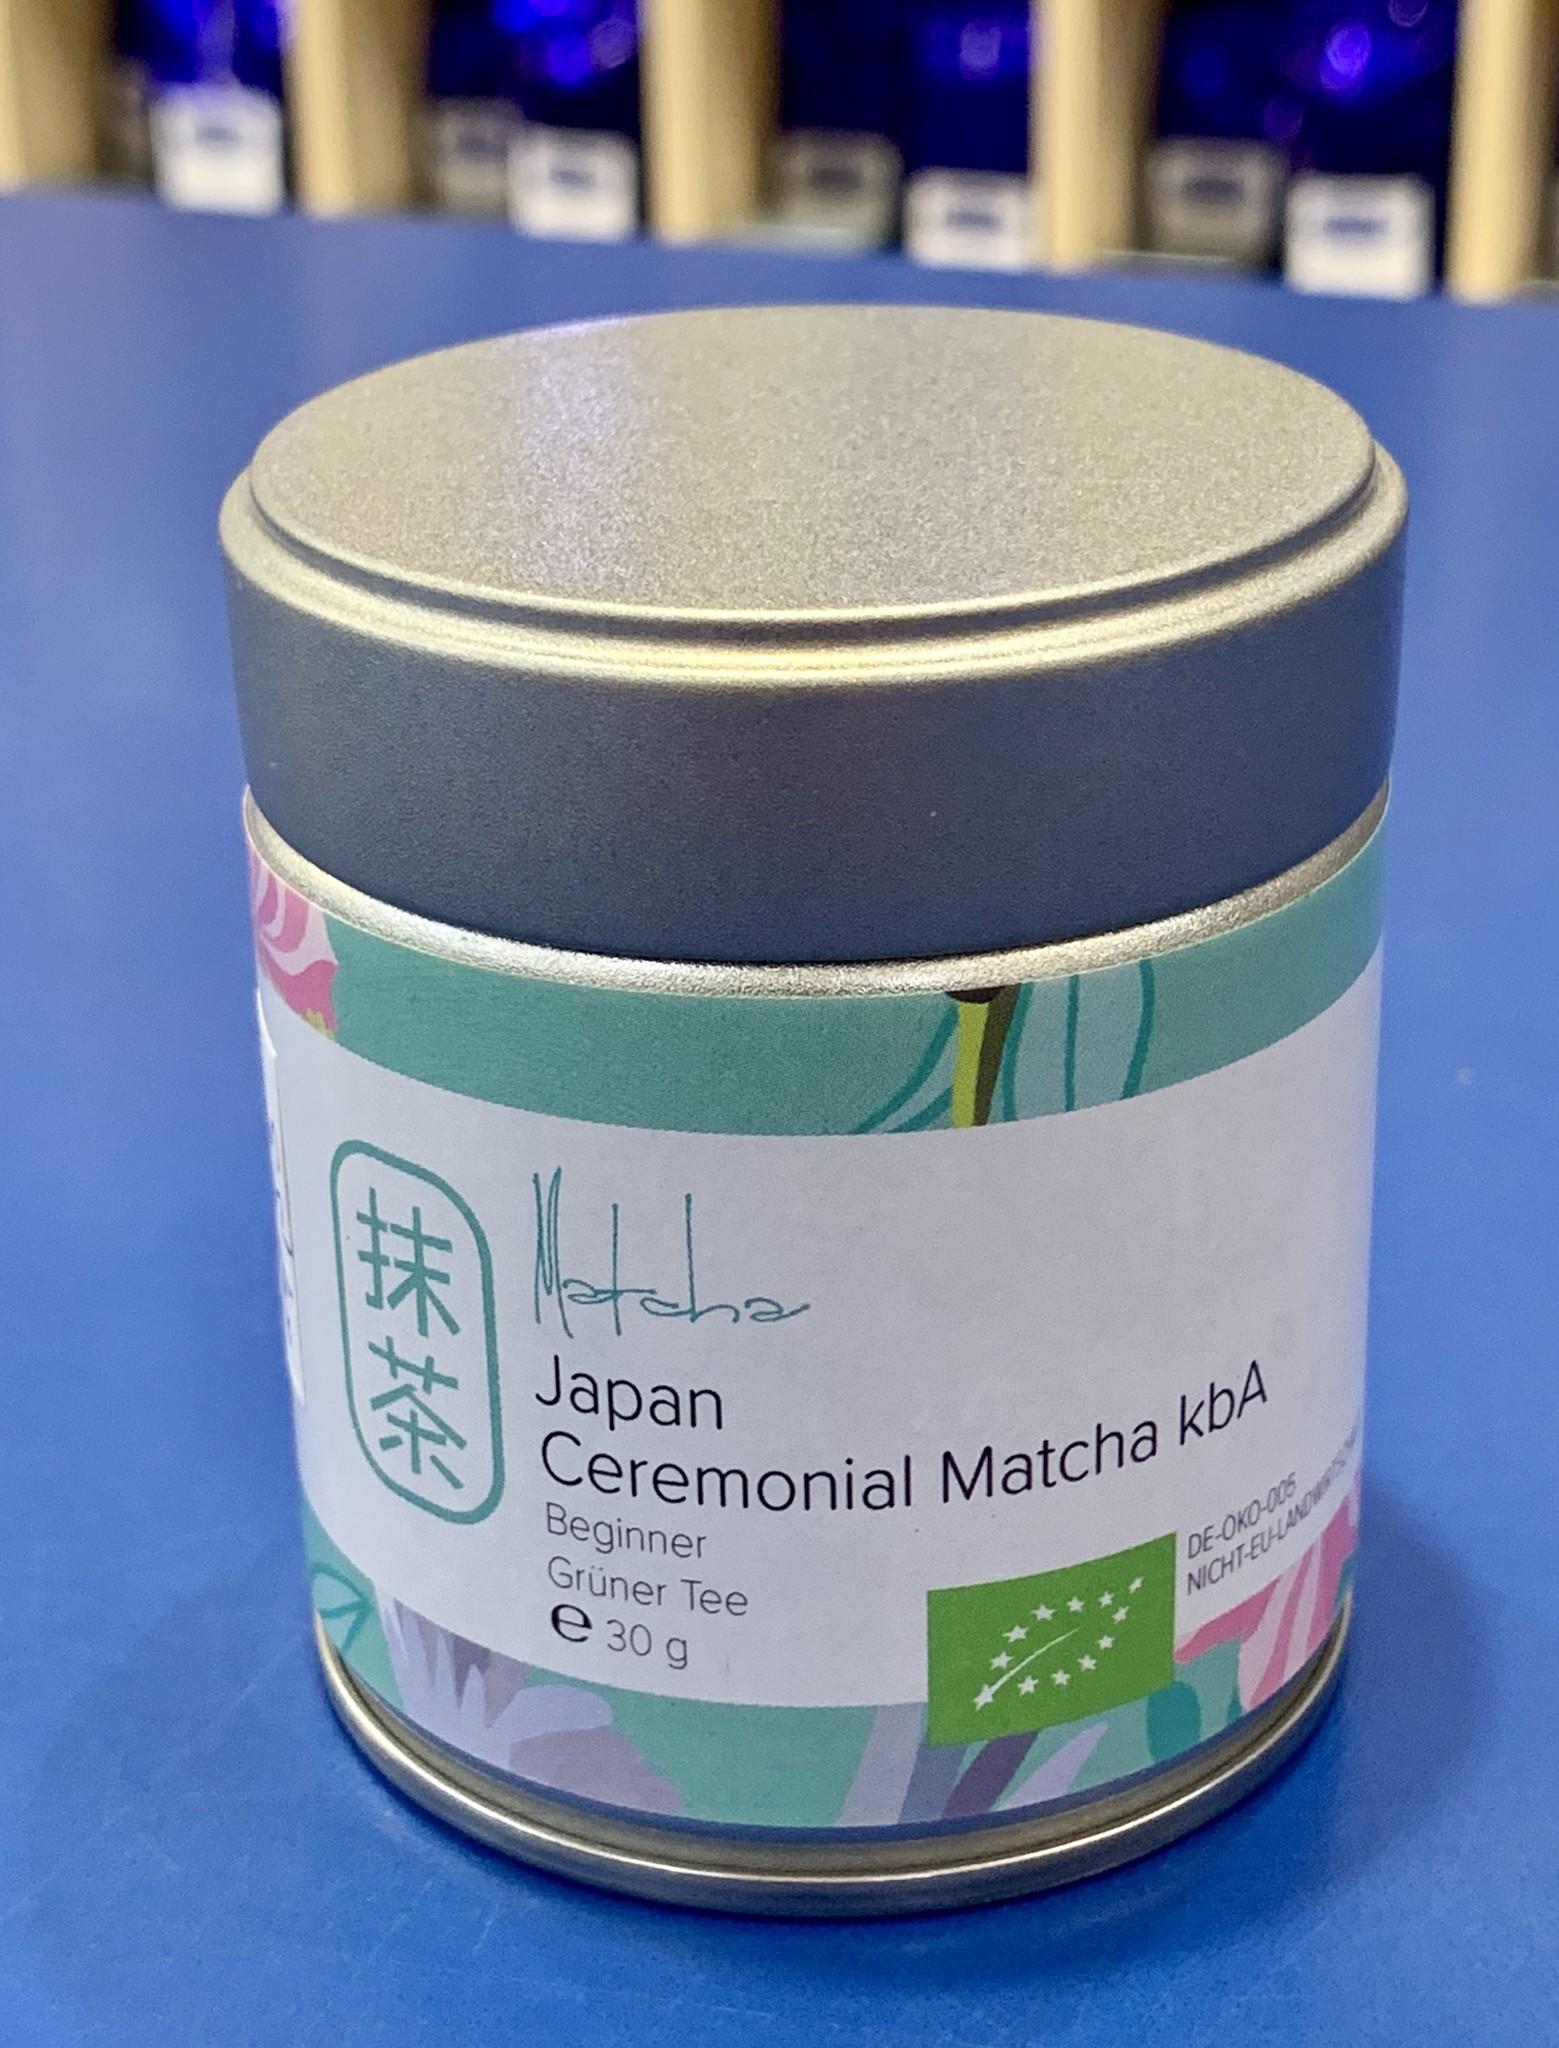 Bio Matcha Japan Ceremonial - Beginner kbA.